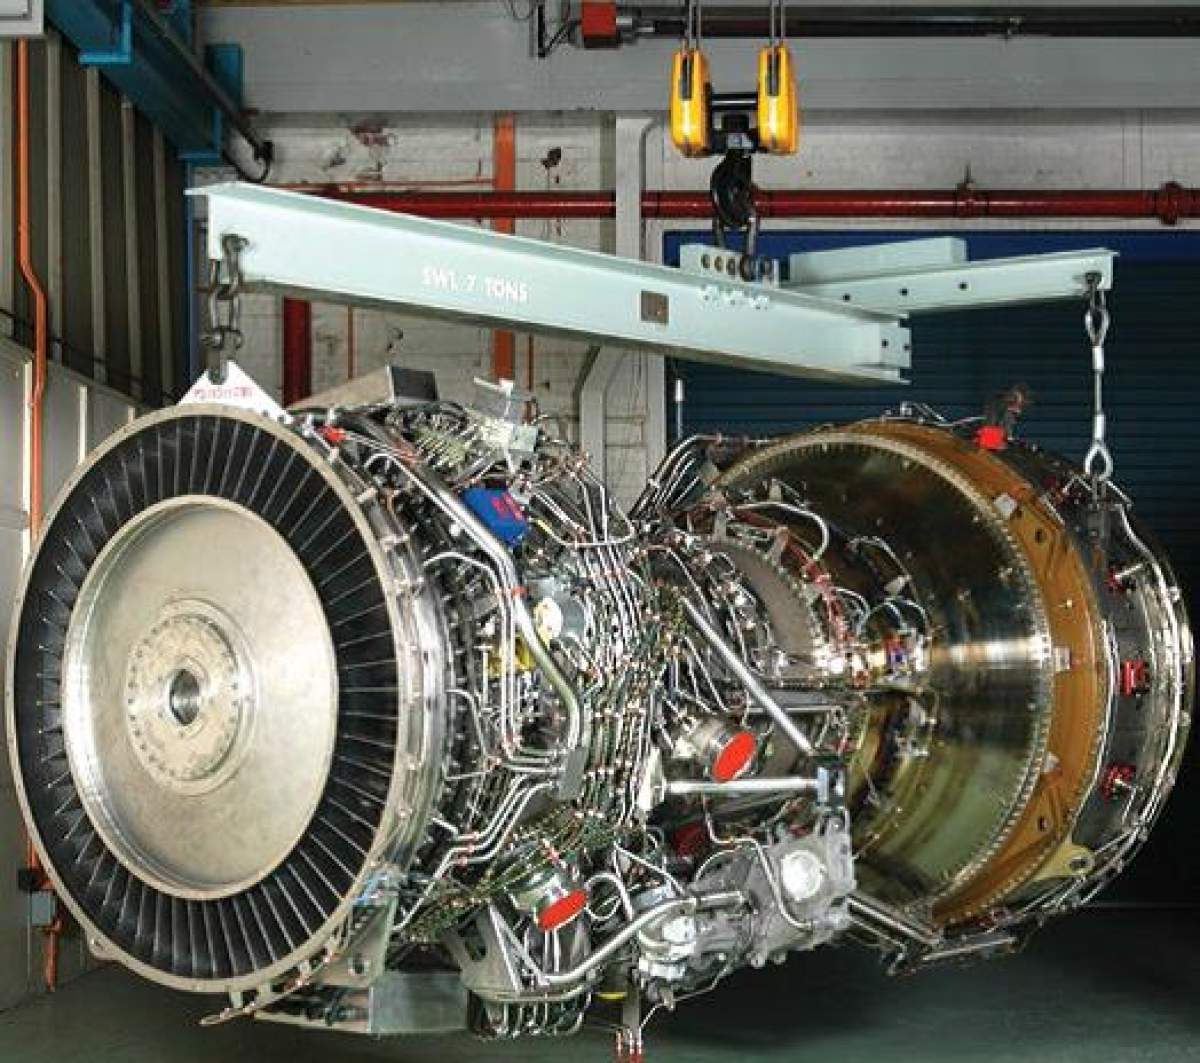 Rolls-Royce and HAL Sign MoU for Supporting MT30 Marine Engine Business | MT30 సముద్ర ఇంజిన్ వ్యాపారాన్ని సహకరించేందుకు రోల్స్ రొయ్స్ మరియు HAL మధ్య కుదిరిన ఒప్పందం |_40.1